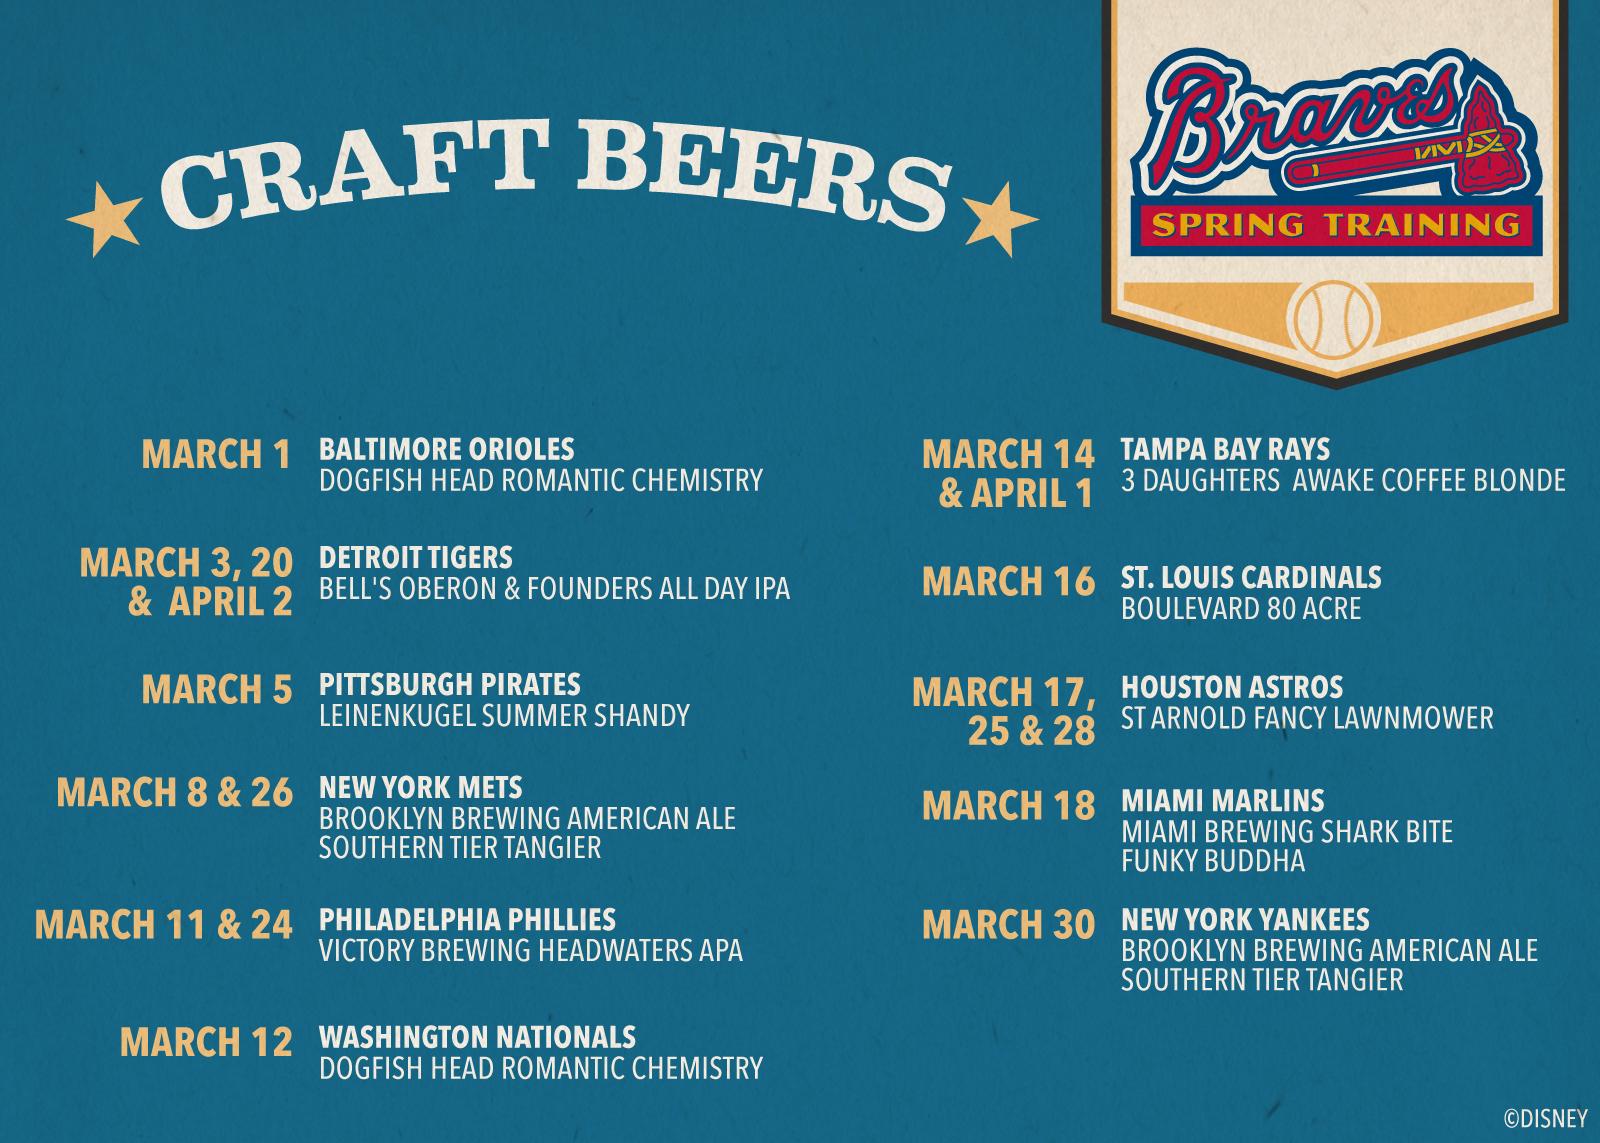 Atlanta Braves Spring Training Coming To Espn Wide World